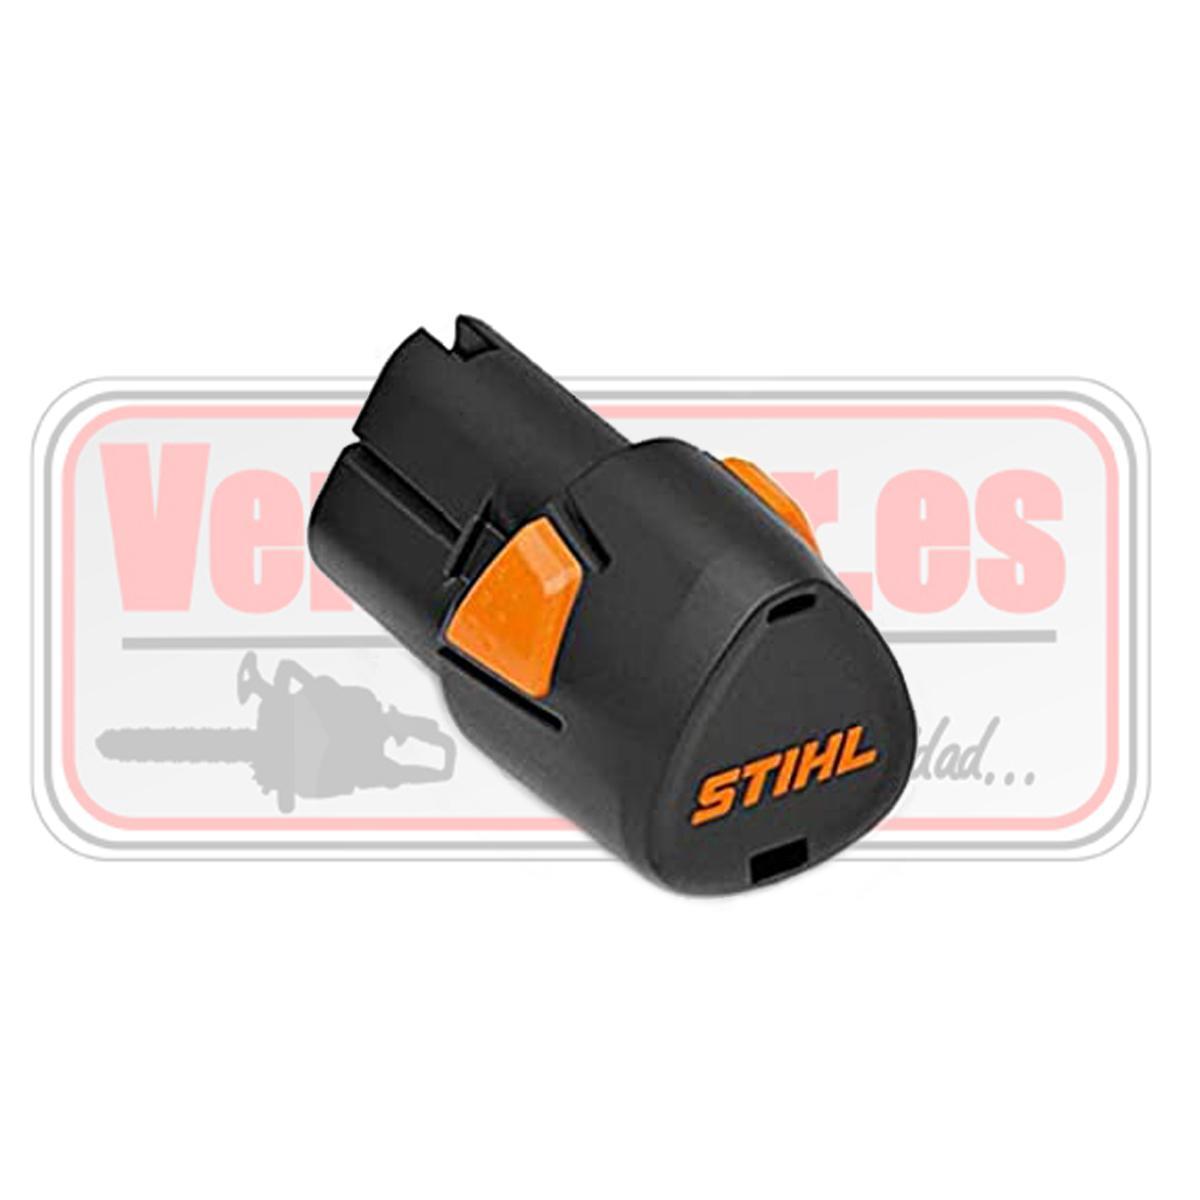 Bateria para Stihl GTA 26